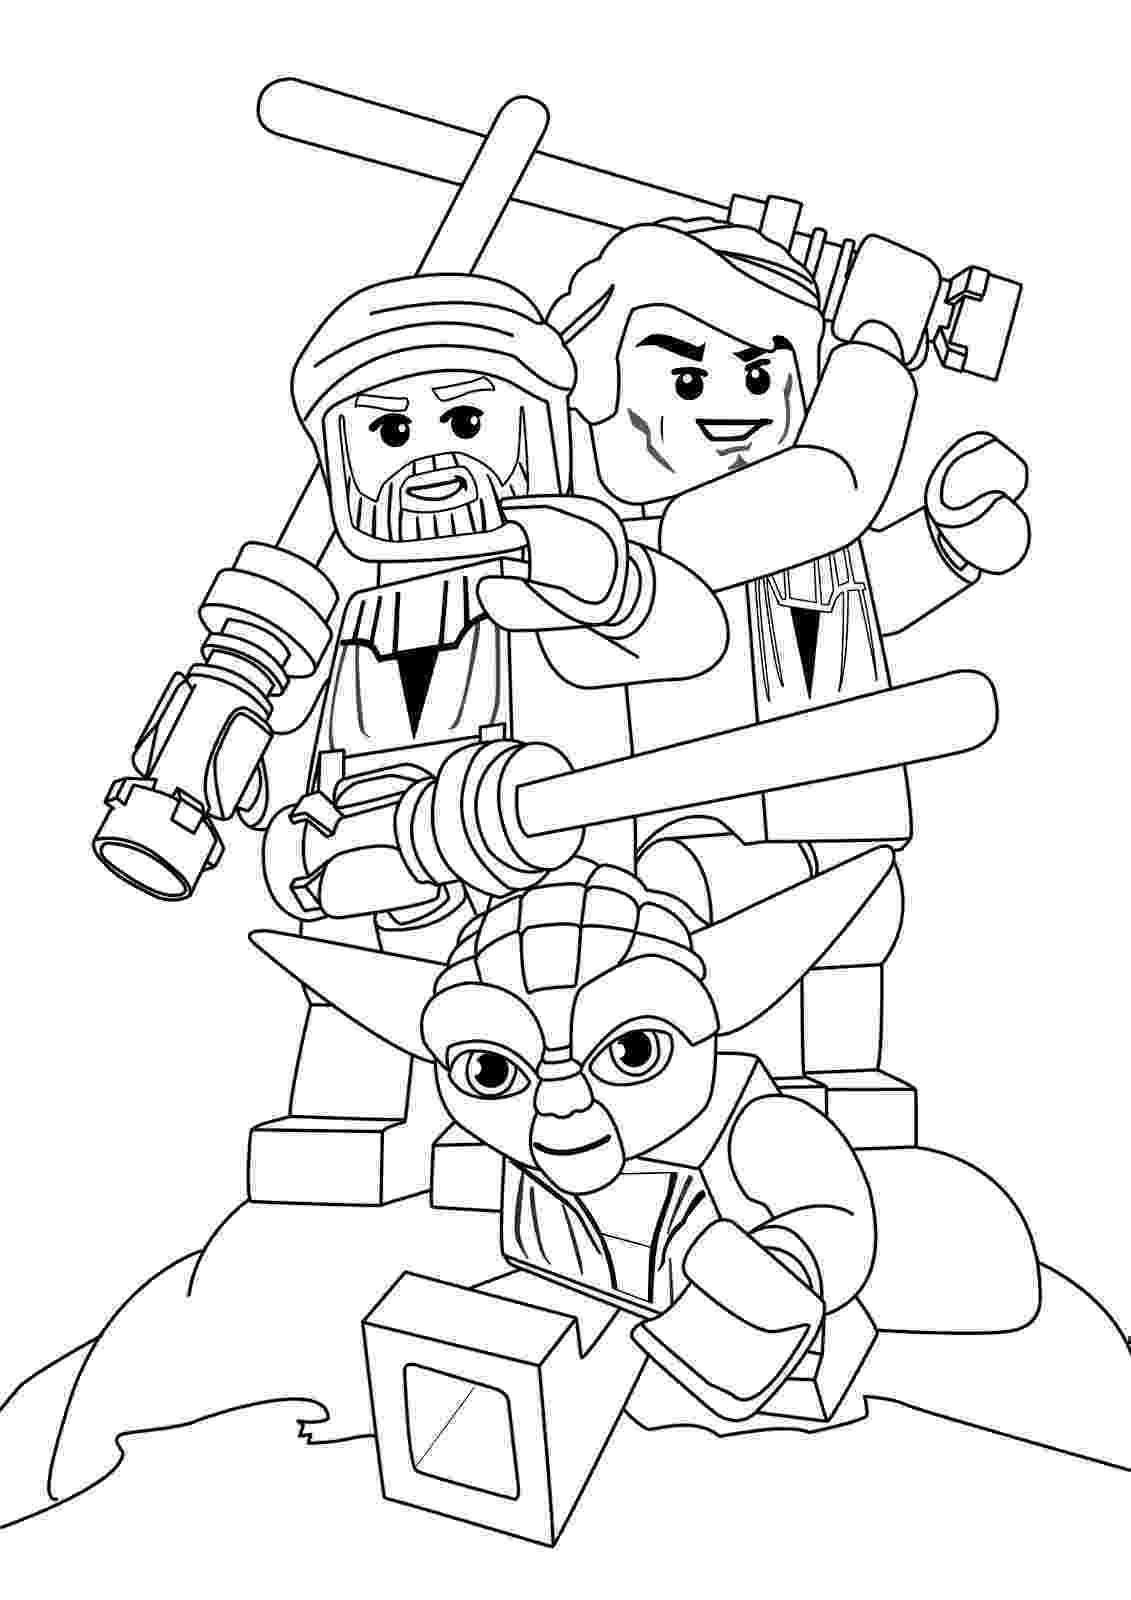 coloring pages of legos lego star wars coloring pages best coloring pages for kids of coloring pages legos